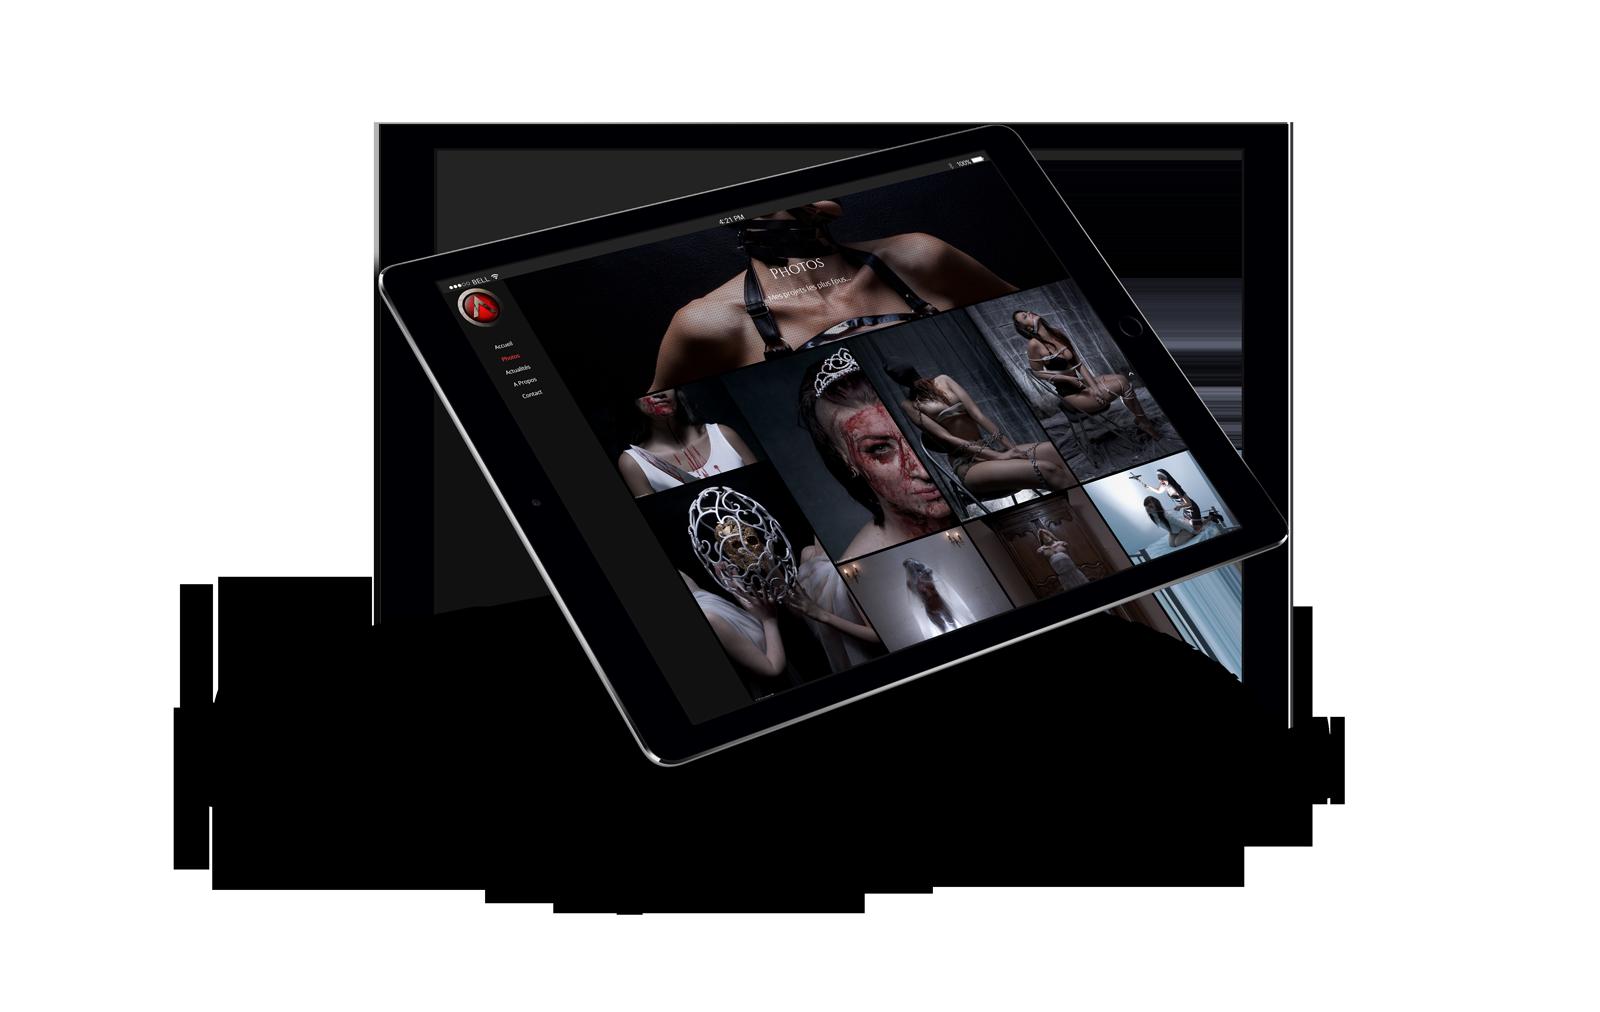 iPad Air 2 Mockup - Acqualeni Photography